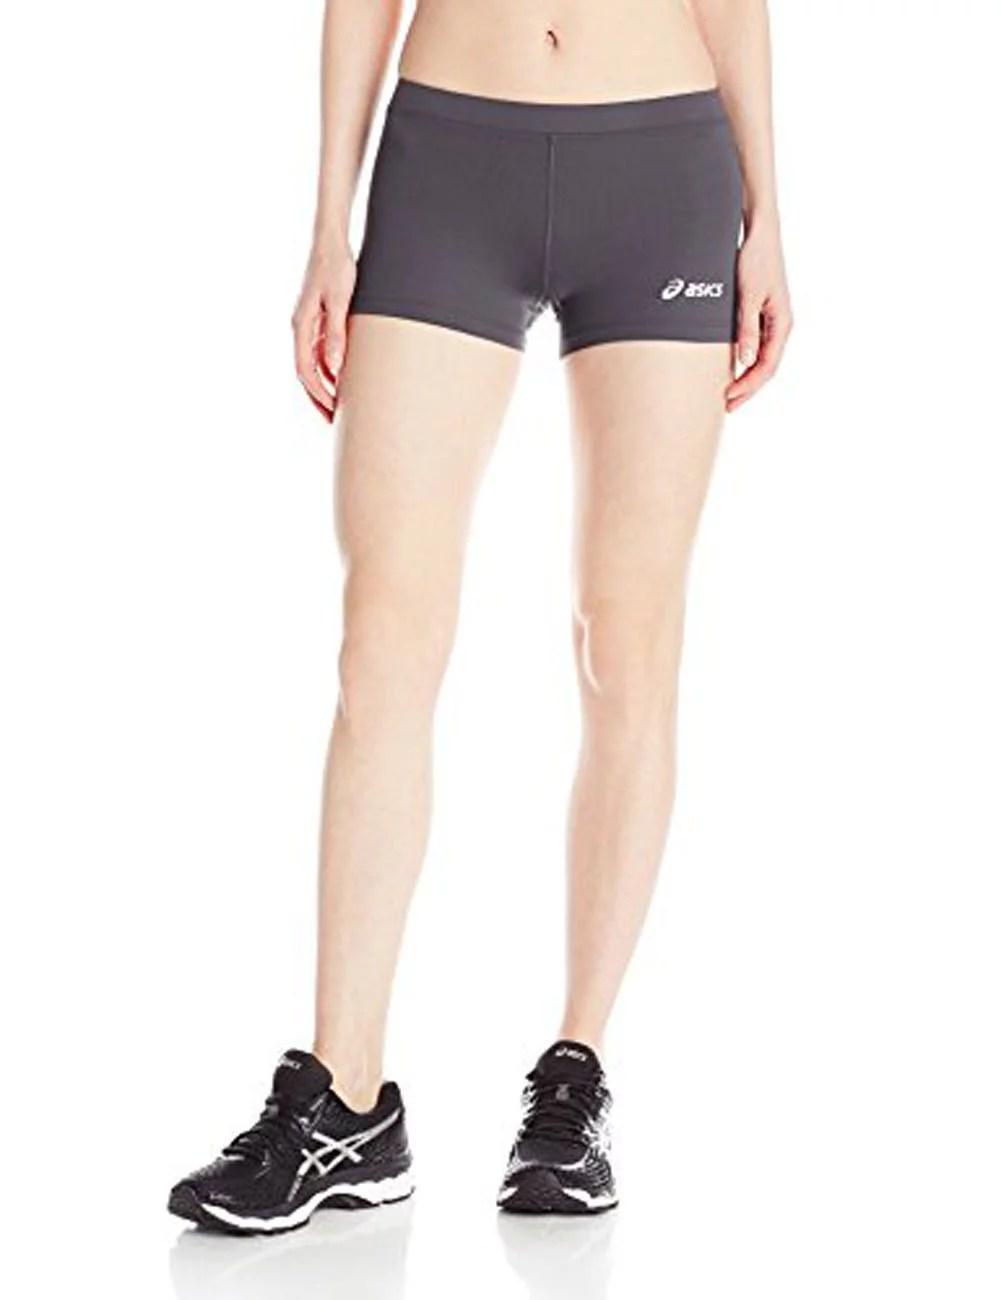 Asics Low Cut Compression Shorts